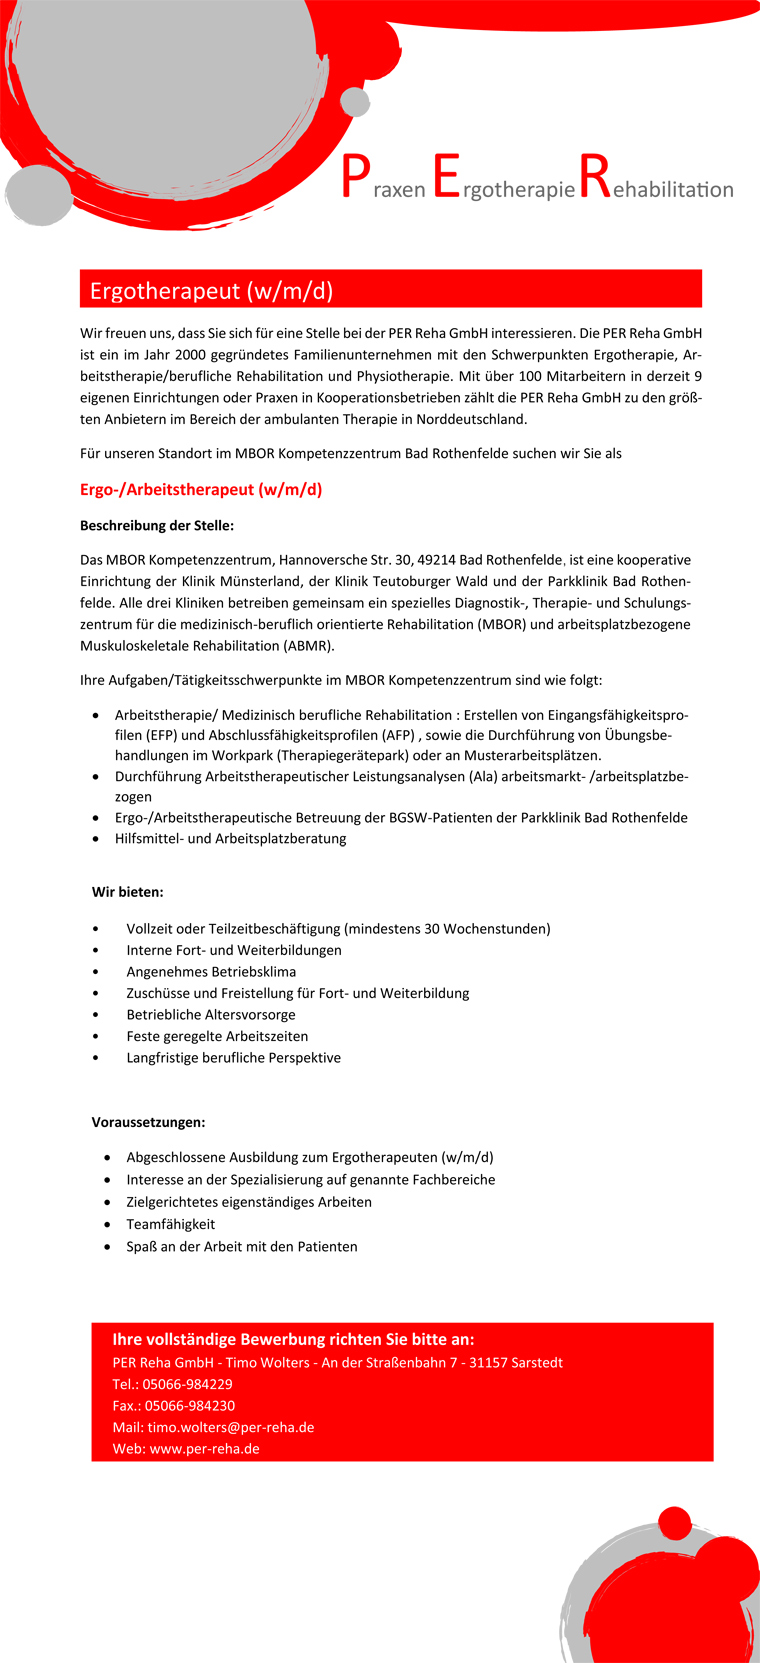 Ergo-/Arbeitstherapeut (m/w/d) in Bad Rothenfelde gesucht!, PER Reha GmbH im MBOR Kompetenzzentrum Bad Rothenfelde